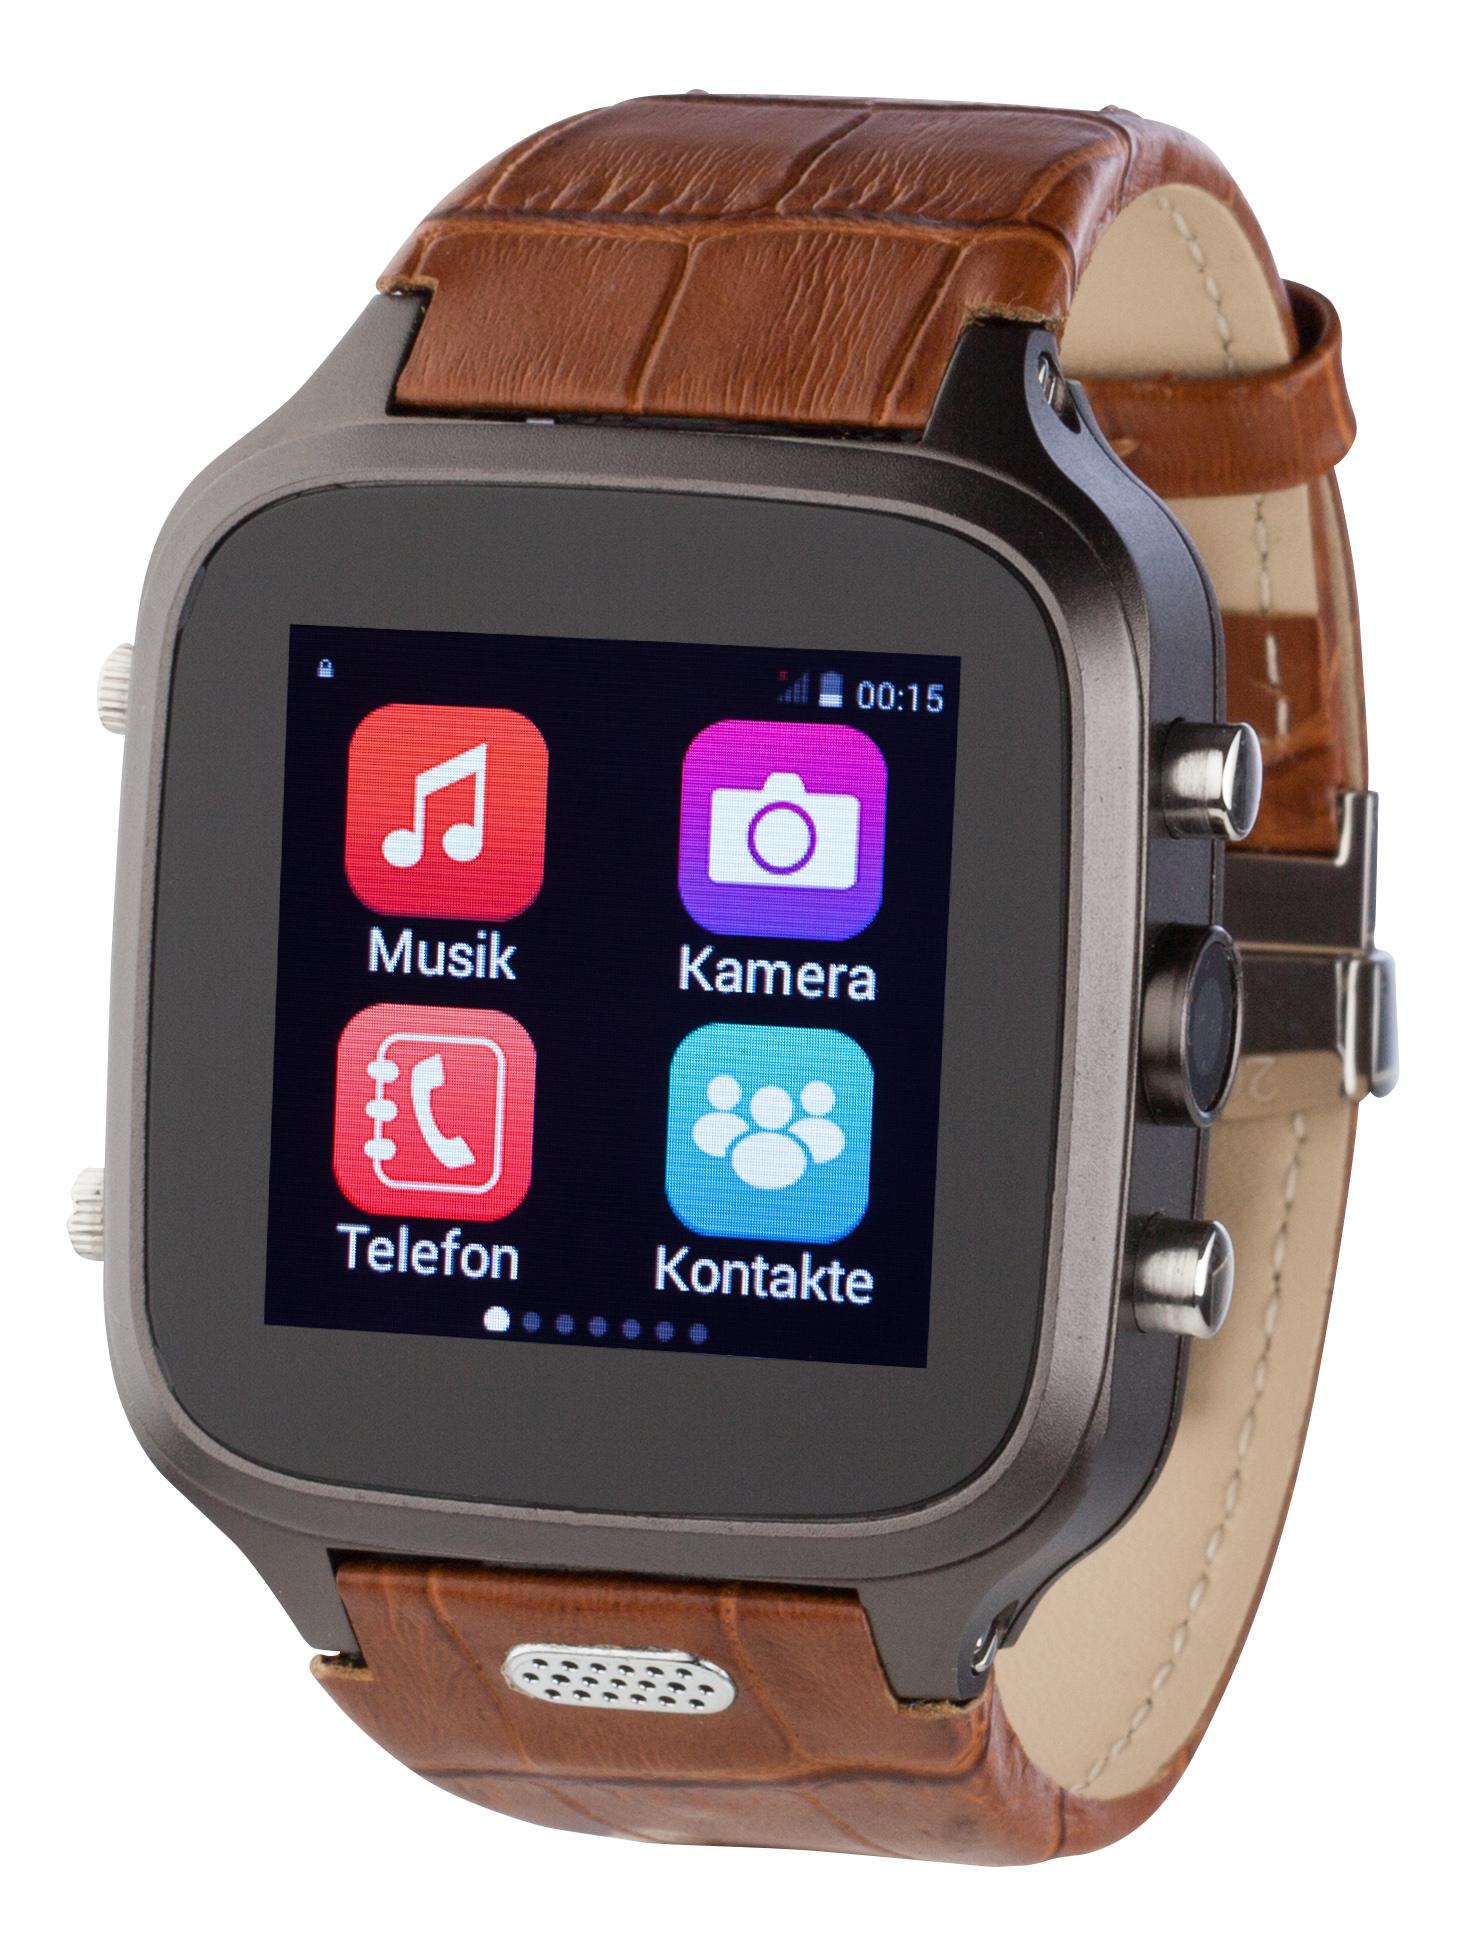 Speq Smartwatch braun Leder Armbanduhr Sim Look Frei Android 4 4 2 Handy Armbanduhren Uhren Wecker Waagen